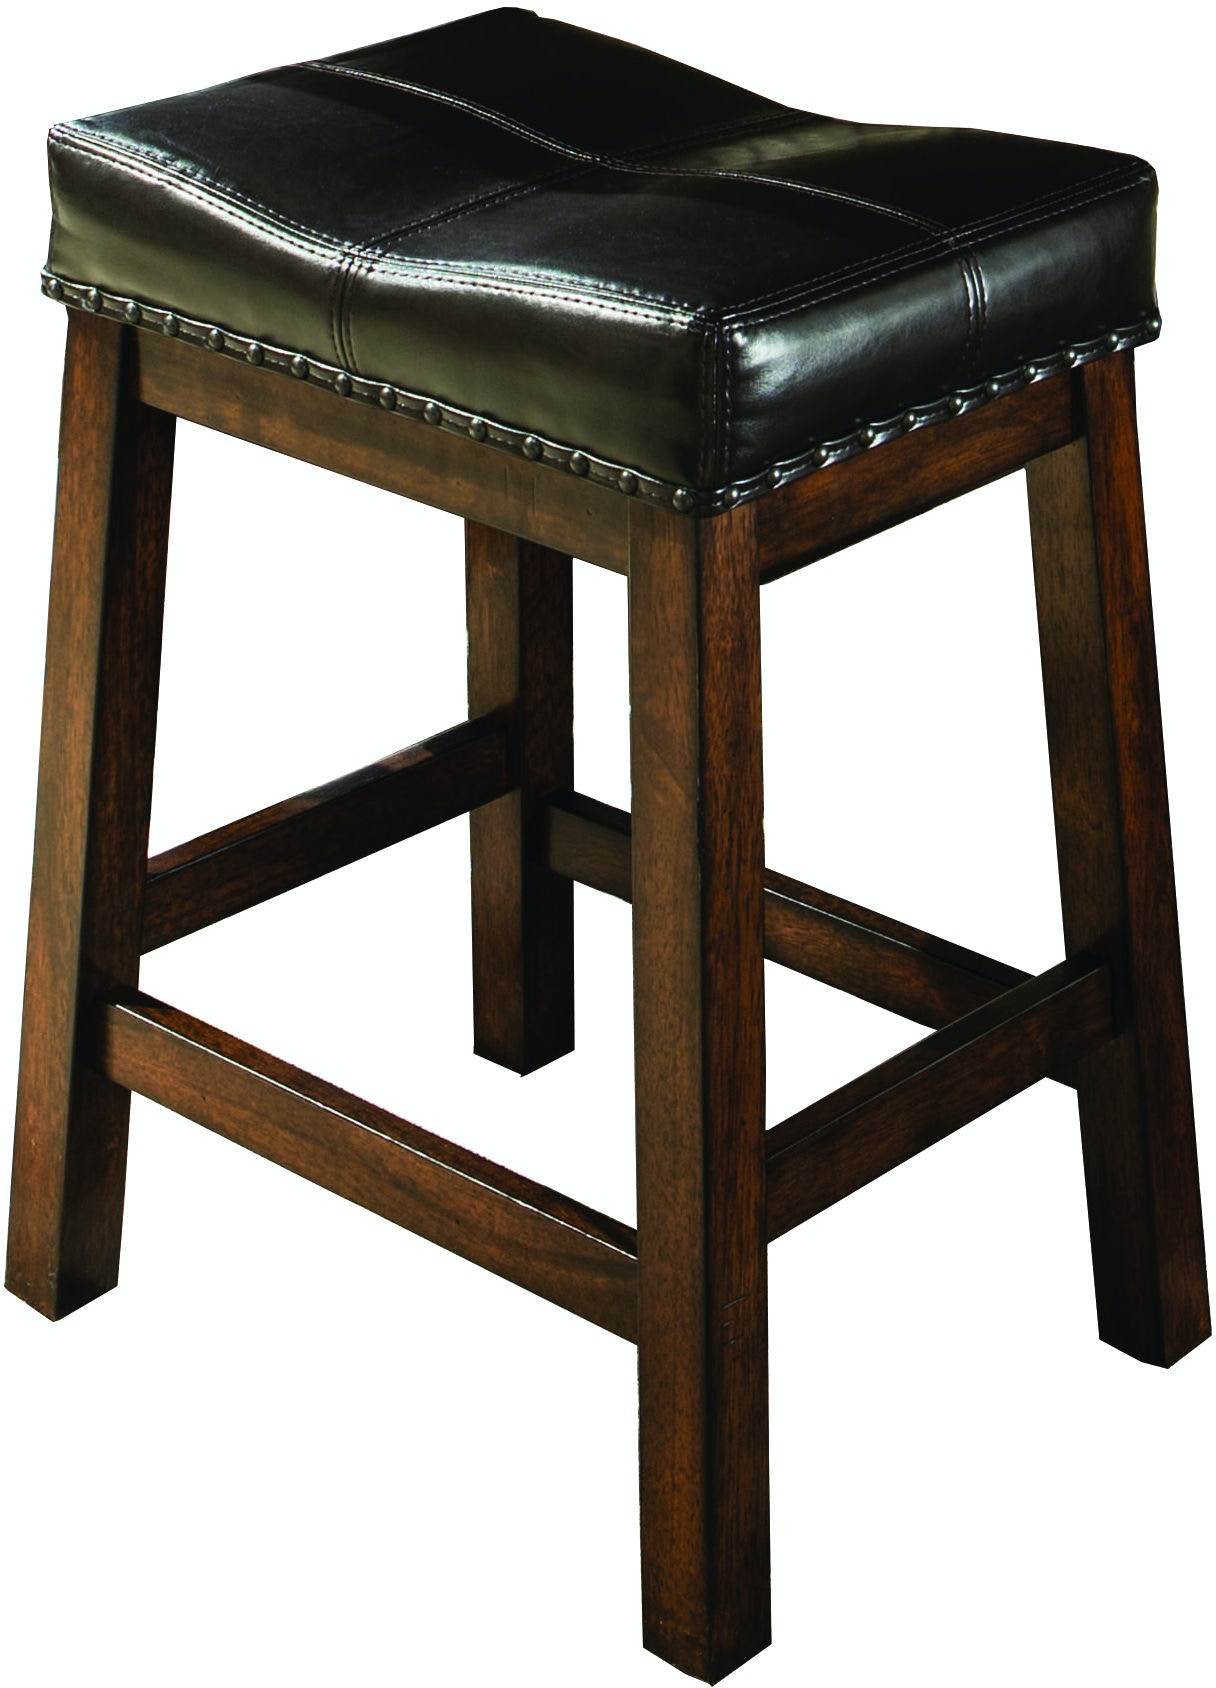 Excellent Intercon Dining Room Kona 24 Backless Barstool Ka Bs 35C Lamtechconsult Wood Chair Design Ideas Lamtechconsultcom